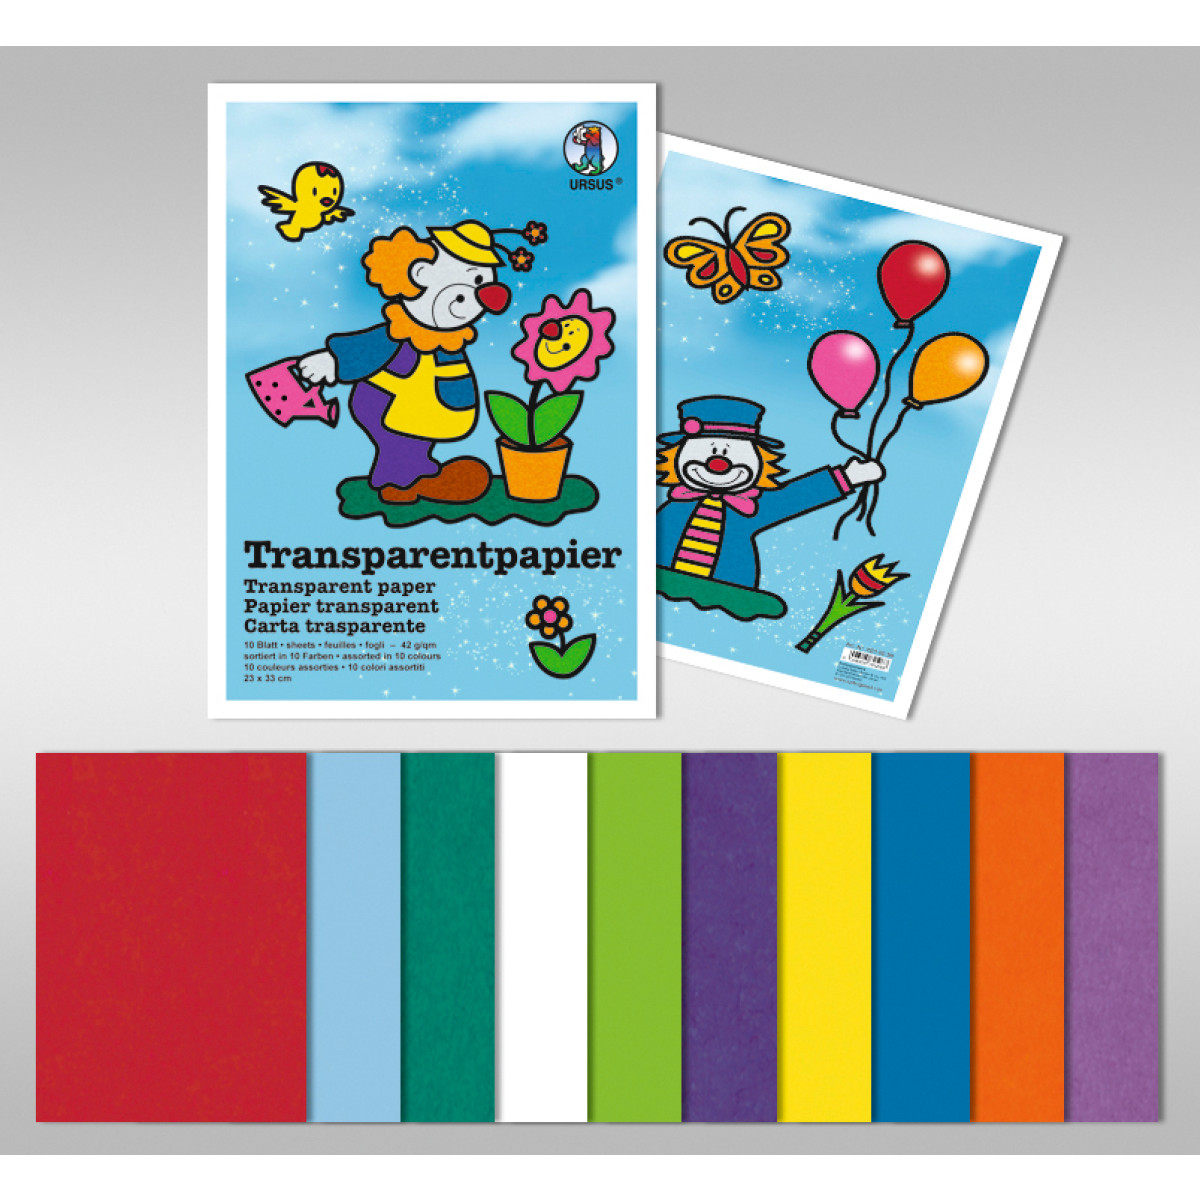 Transparentpapier (Drachenpapier) 42 g/qm 35 x 50 cm - 25 Blatt